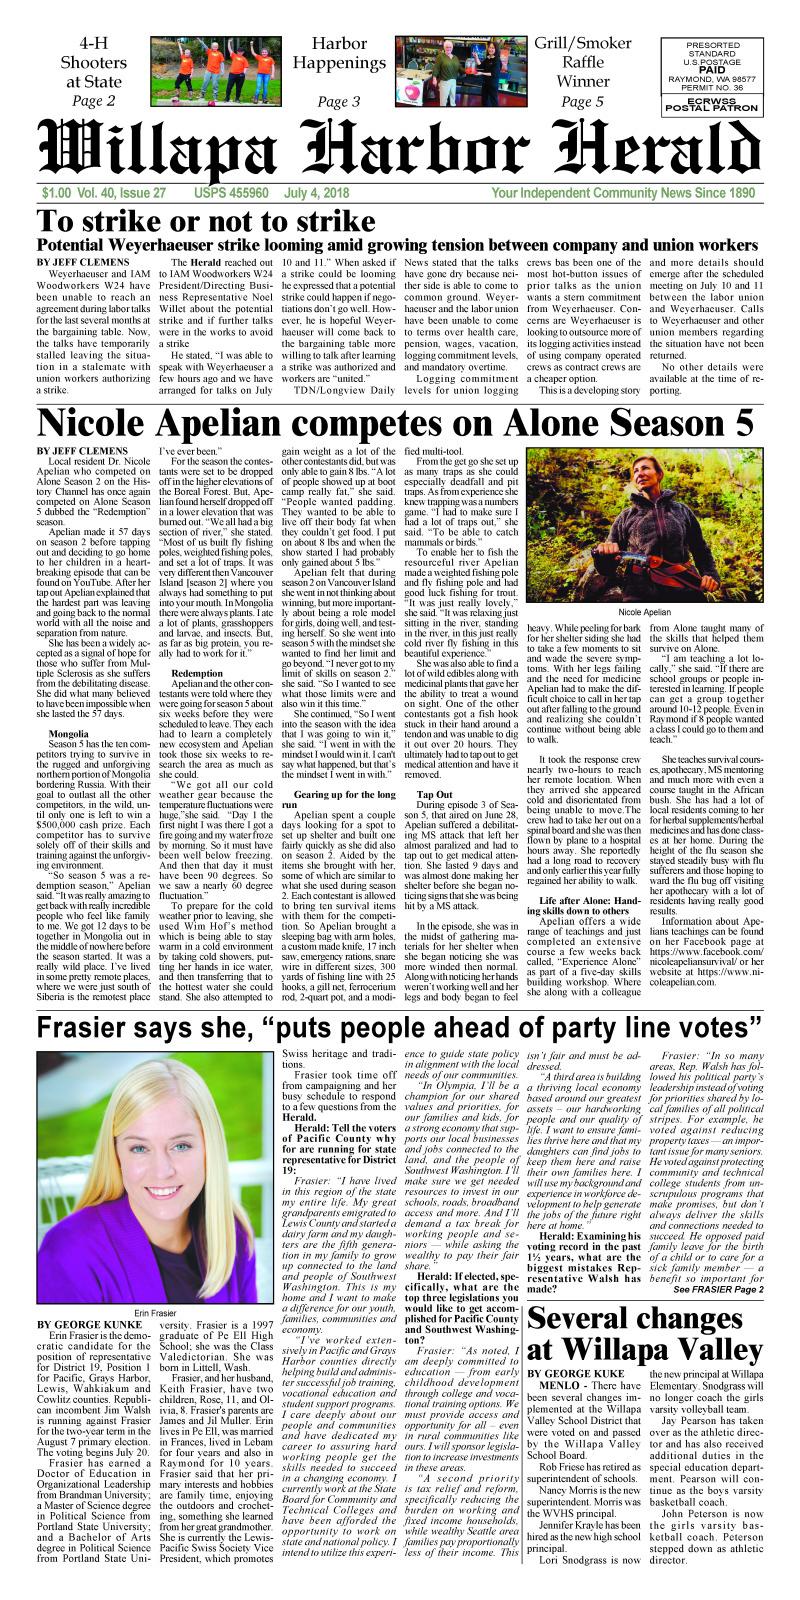 July 4, 2018 Willapa Harbor Herald